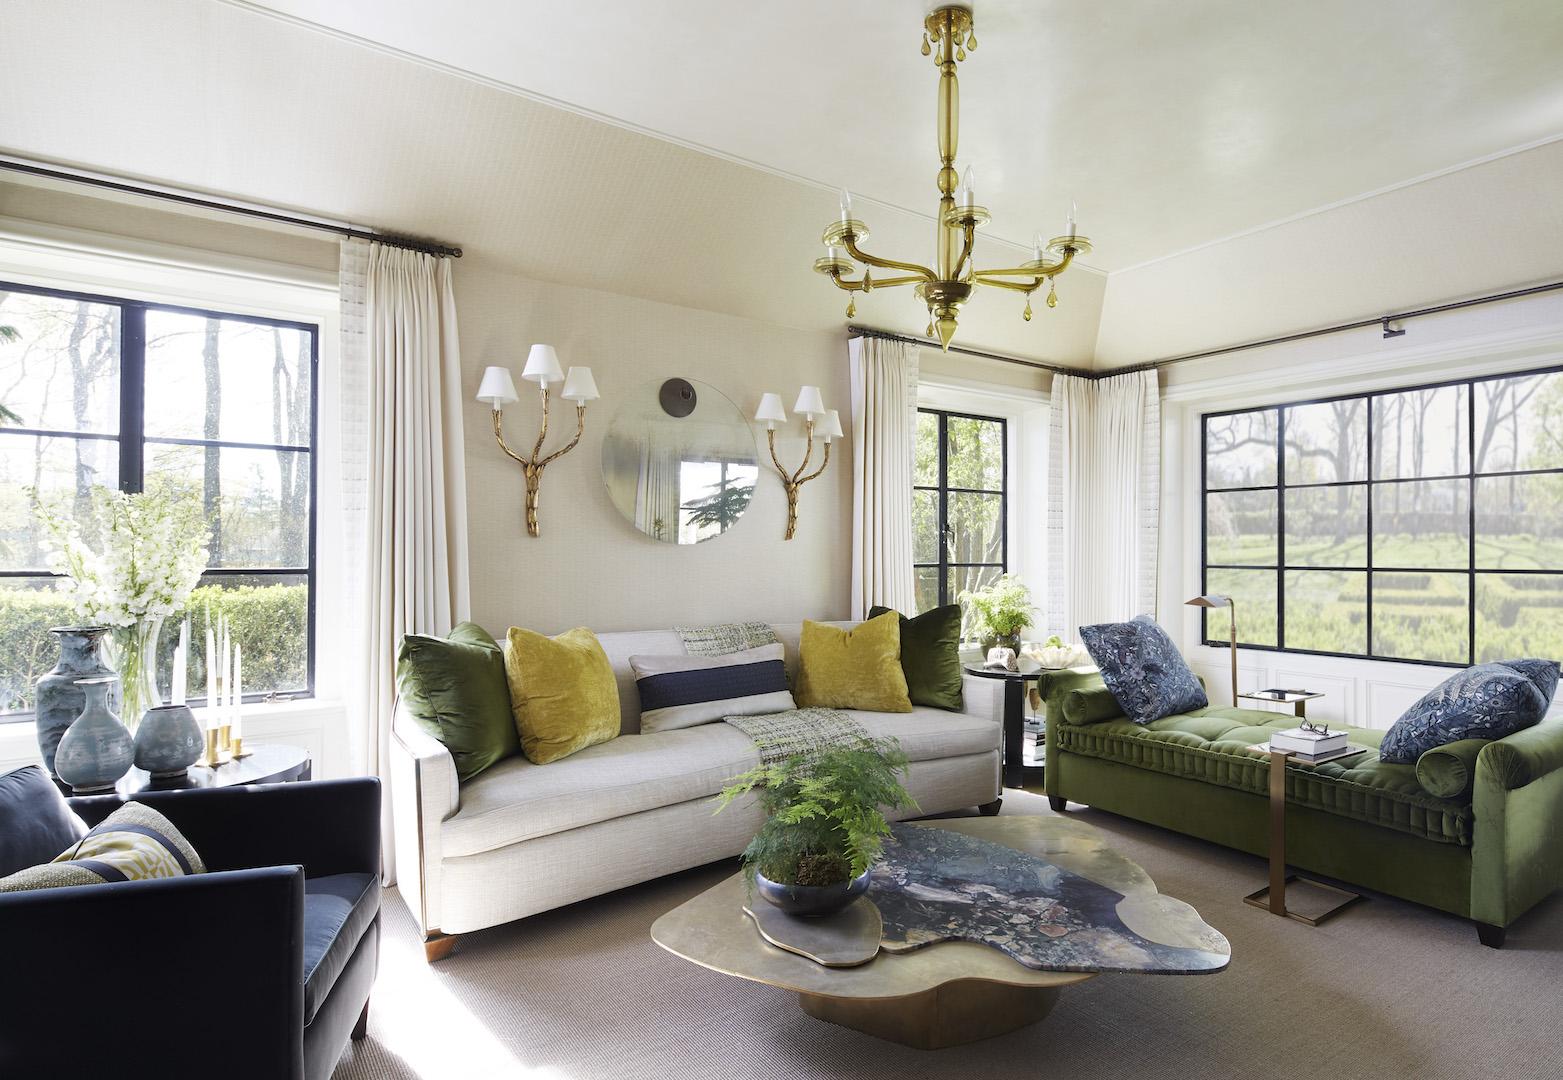 custom daybed, custom tuxedo chairs & throw pillows  Interior Design & Architecture: Lichten Craig Architecture & Interiors